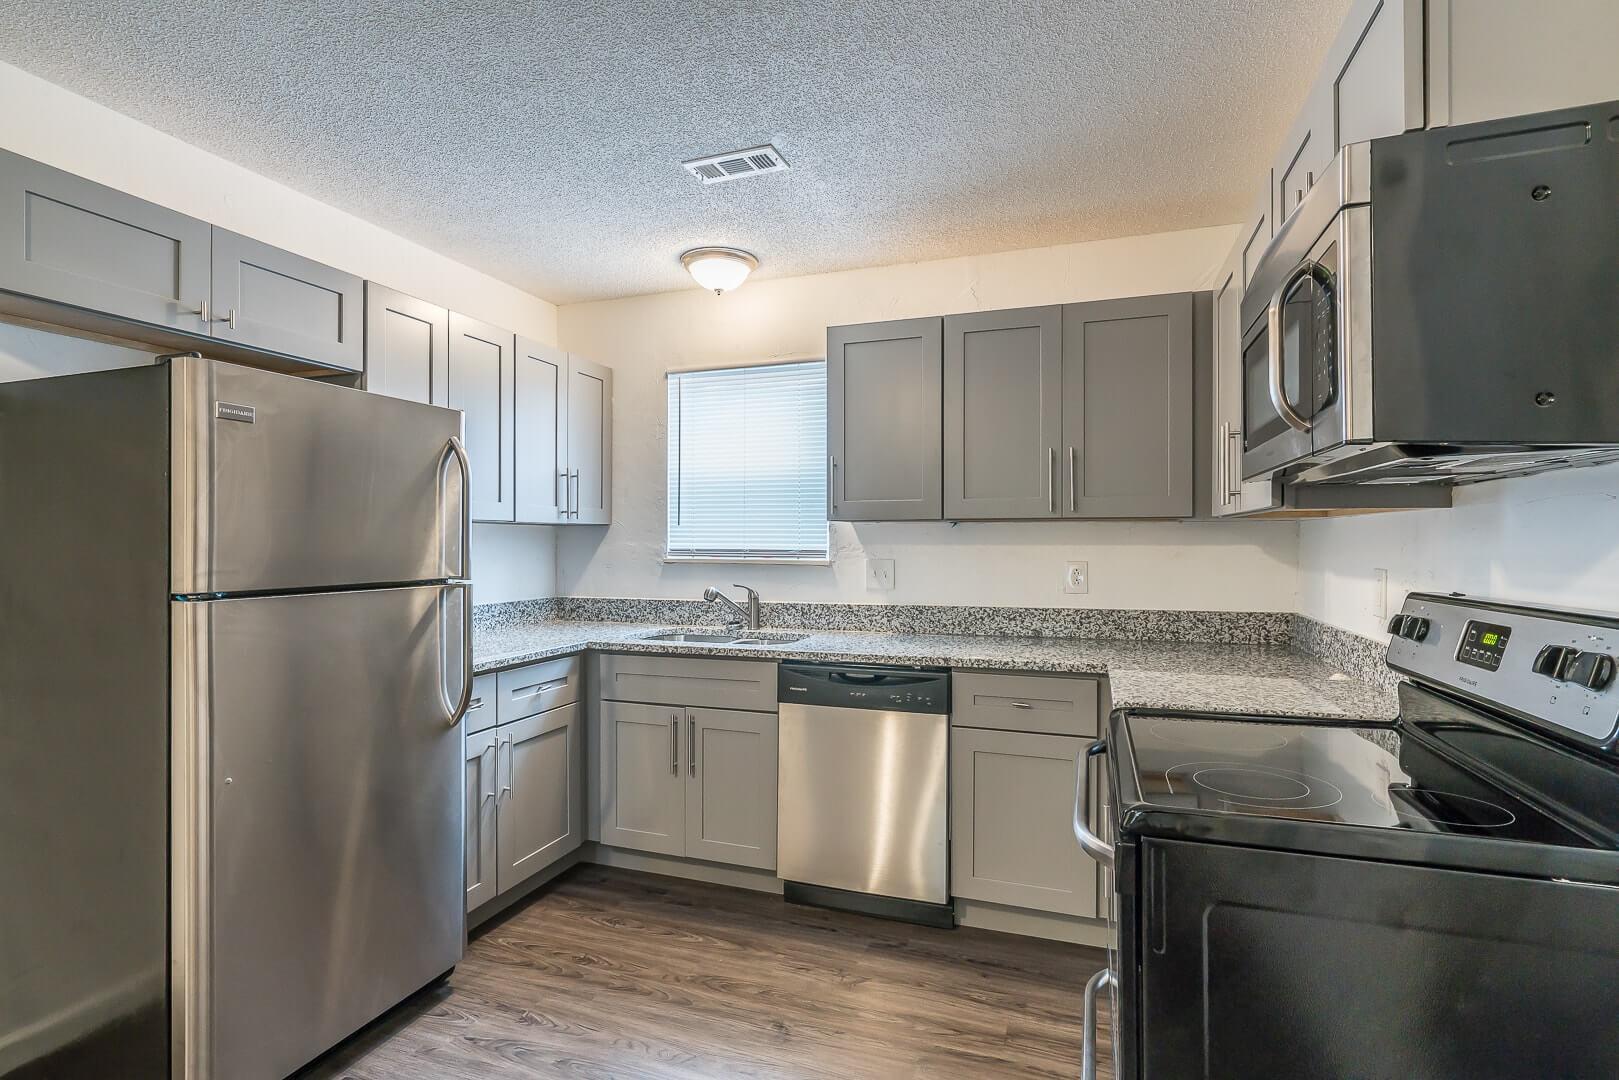 Two Bedroom Apartments O'Fallon IL